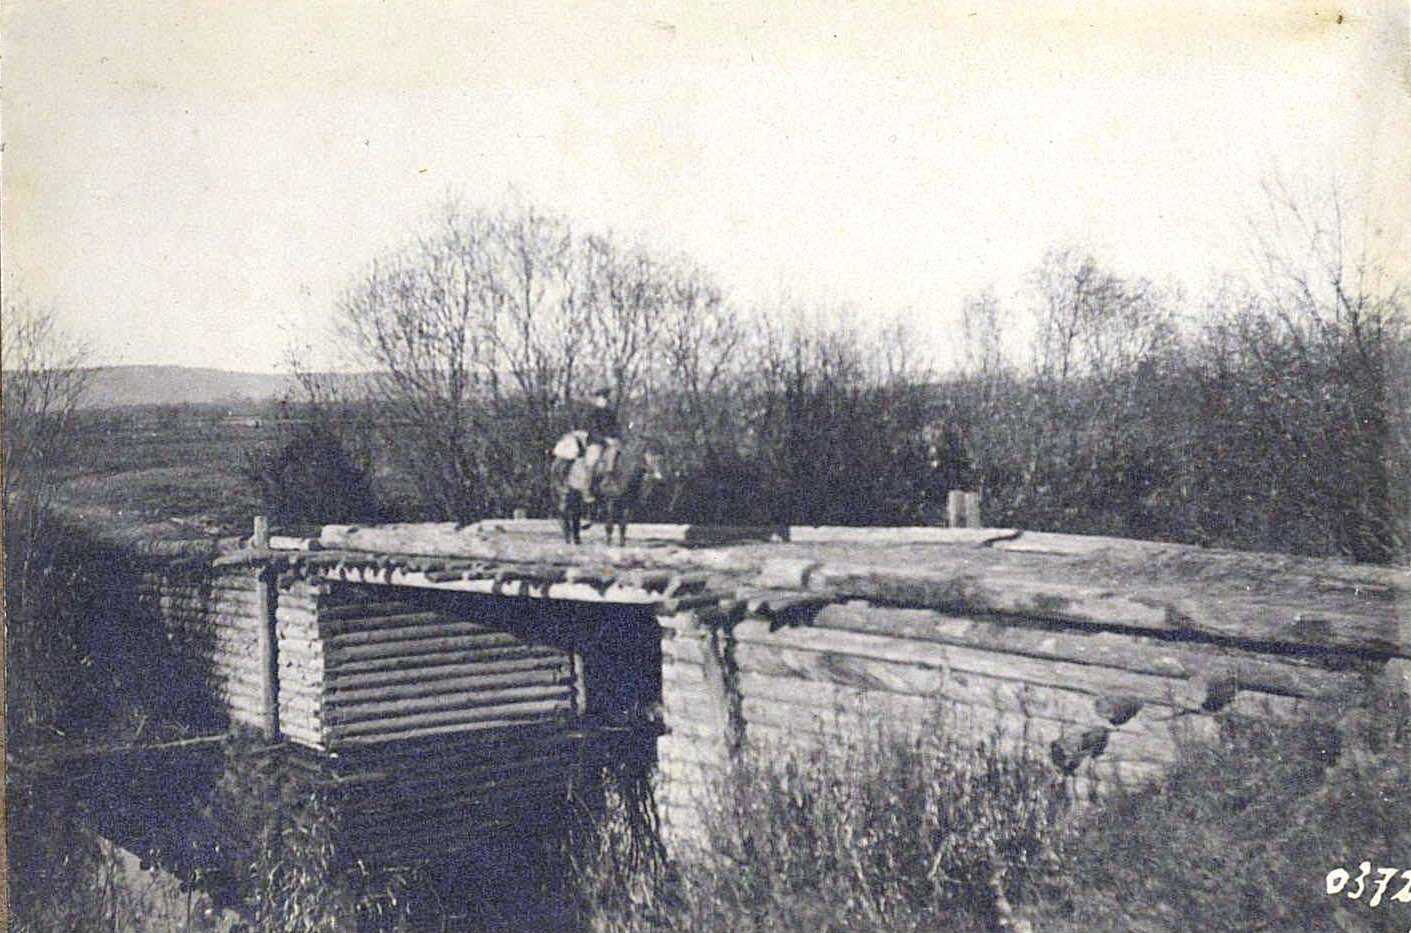 372. Мост через протоку ниже Бейтоновского